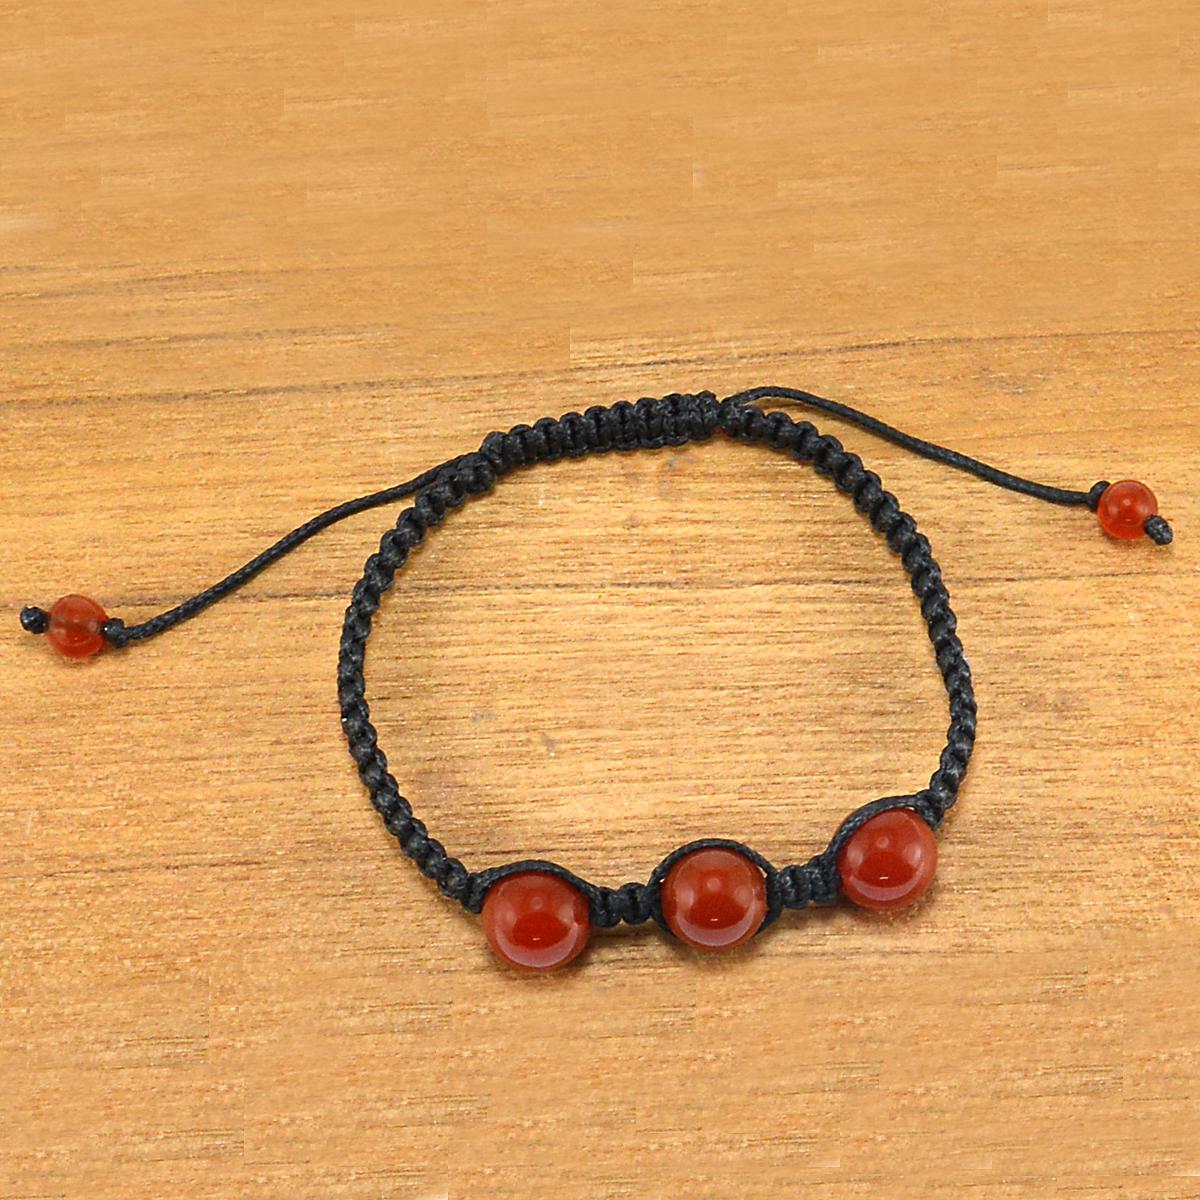 Red Onyx Gemstone Adjustable Bracelet PG-155841